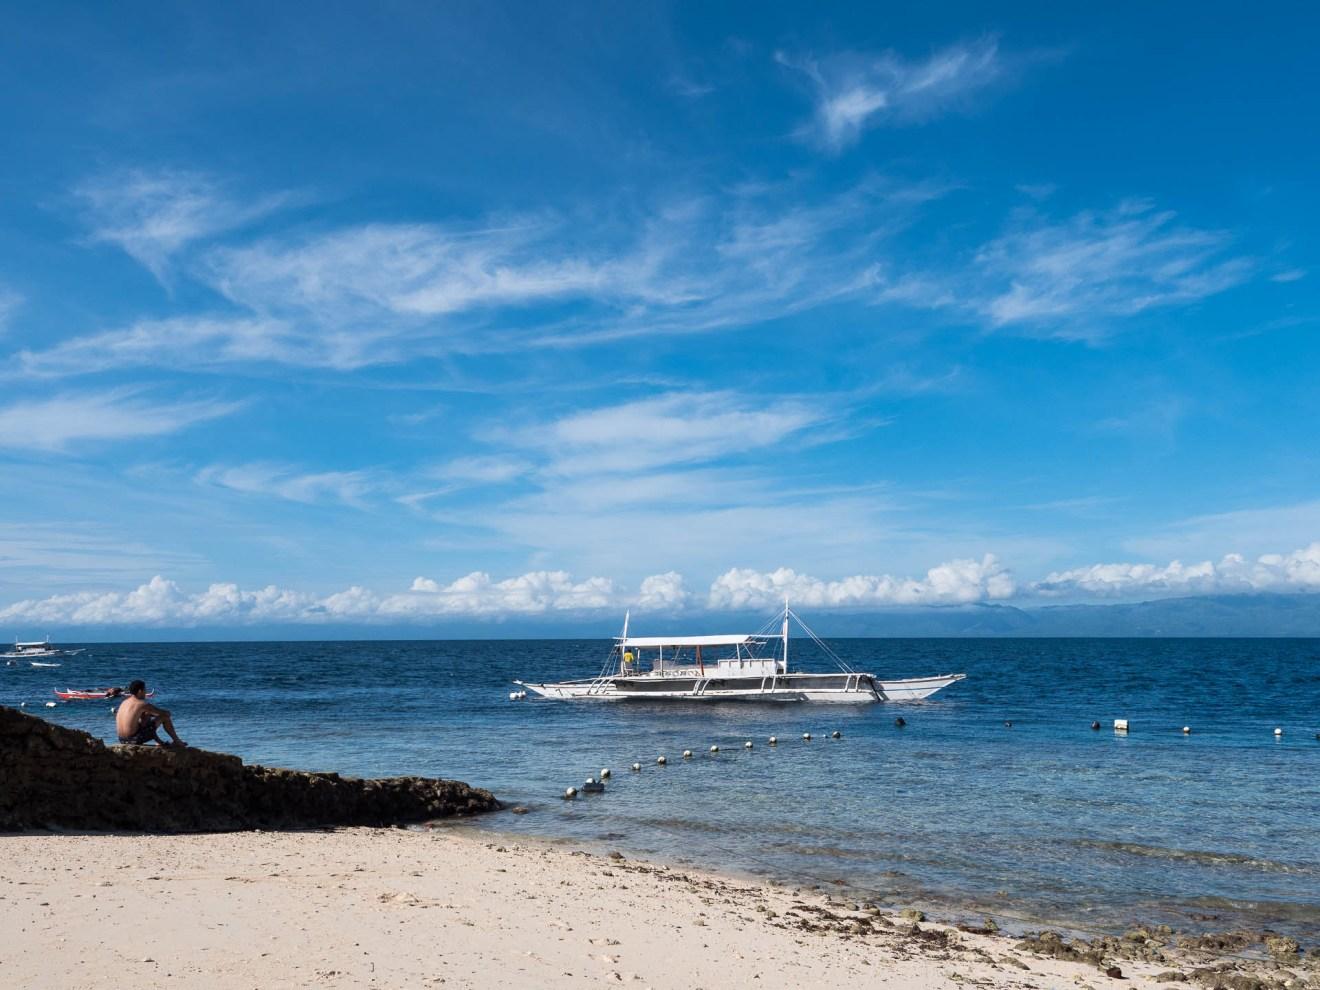 plage de moalboal - Philippines